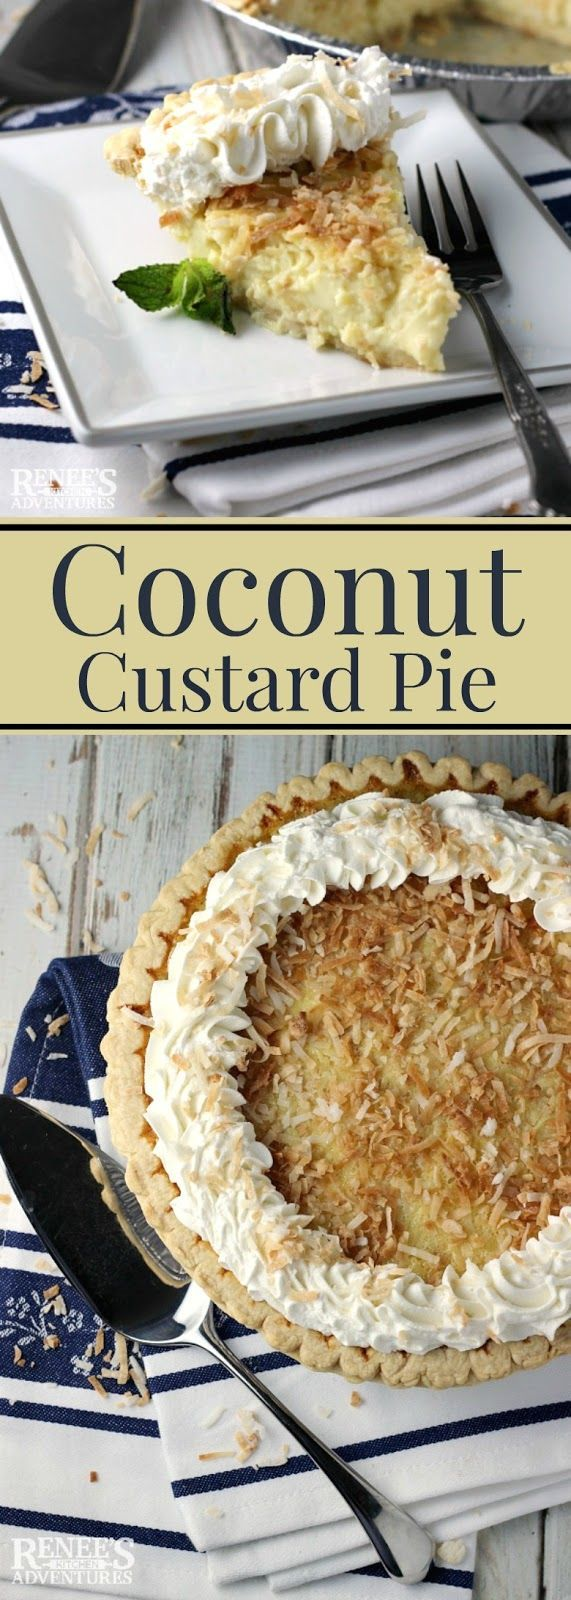 Coconut Custard Pie   Renee's Kitchen Adventures - easy dessert pie recipe for a toasted coconut custard pie made with milk, eggs and sugar. #SundaySupper #coconut #coconutrecipe #coconutpie #dessert